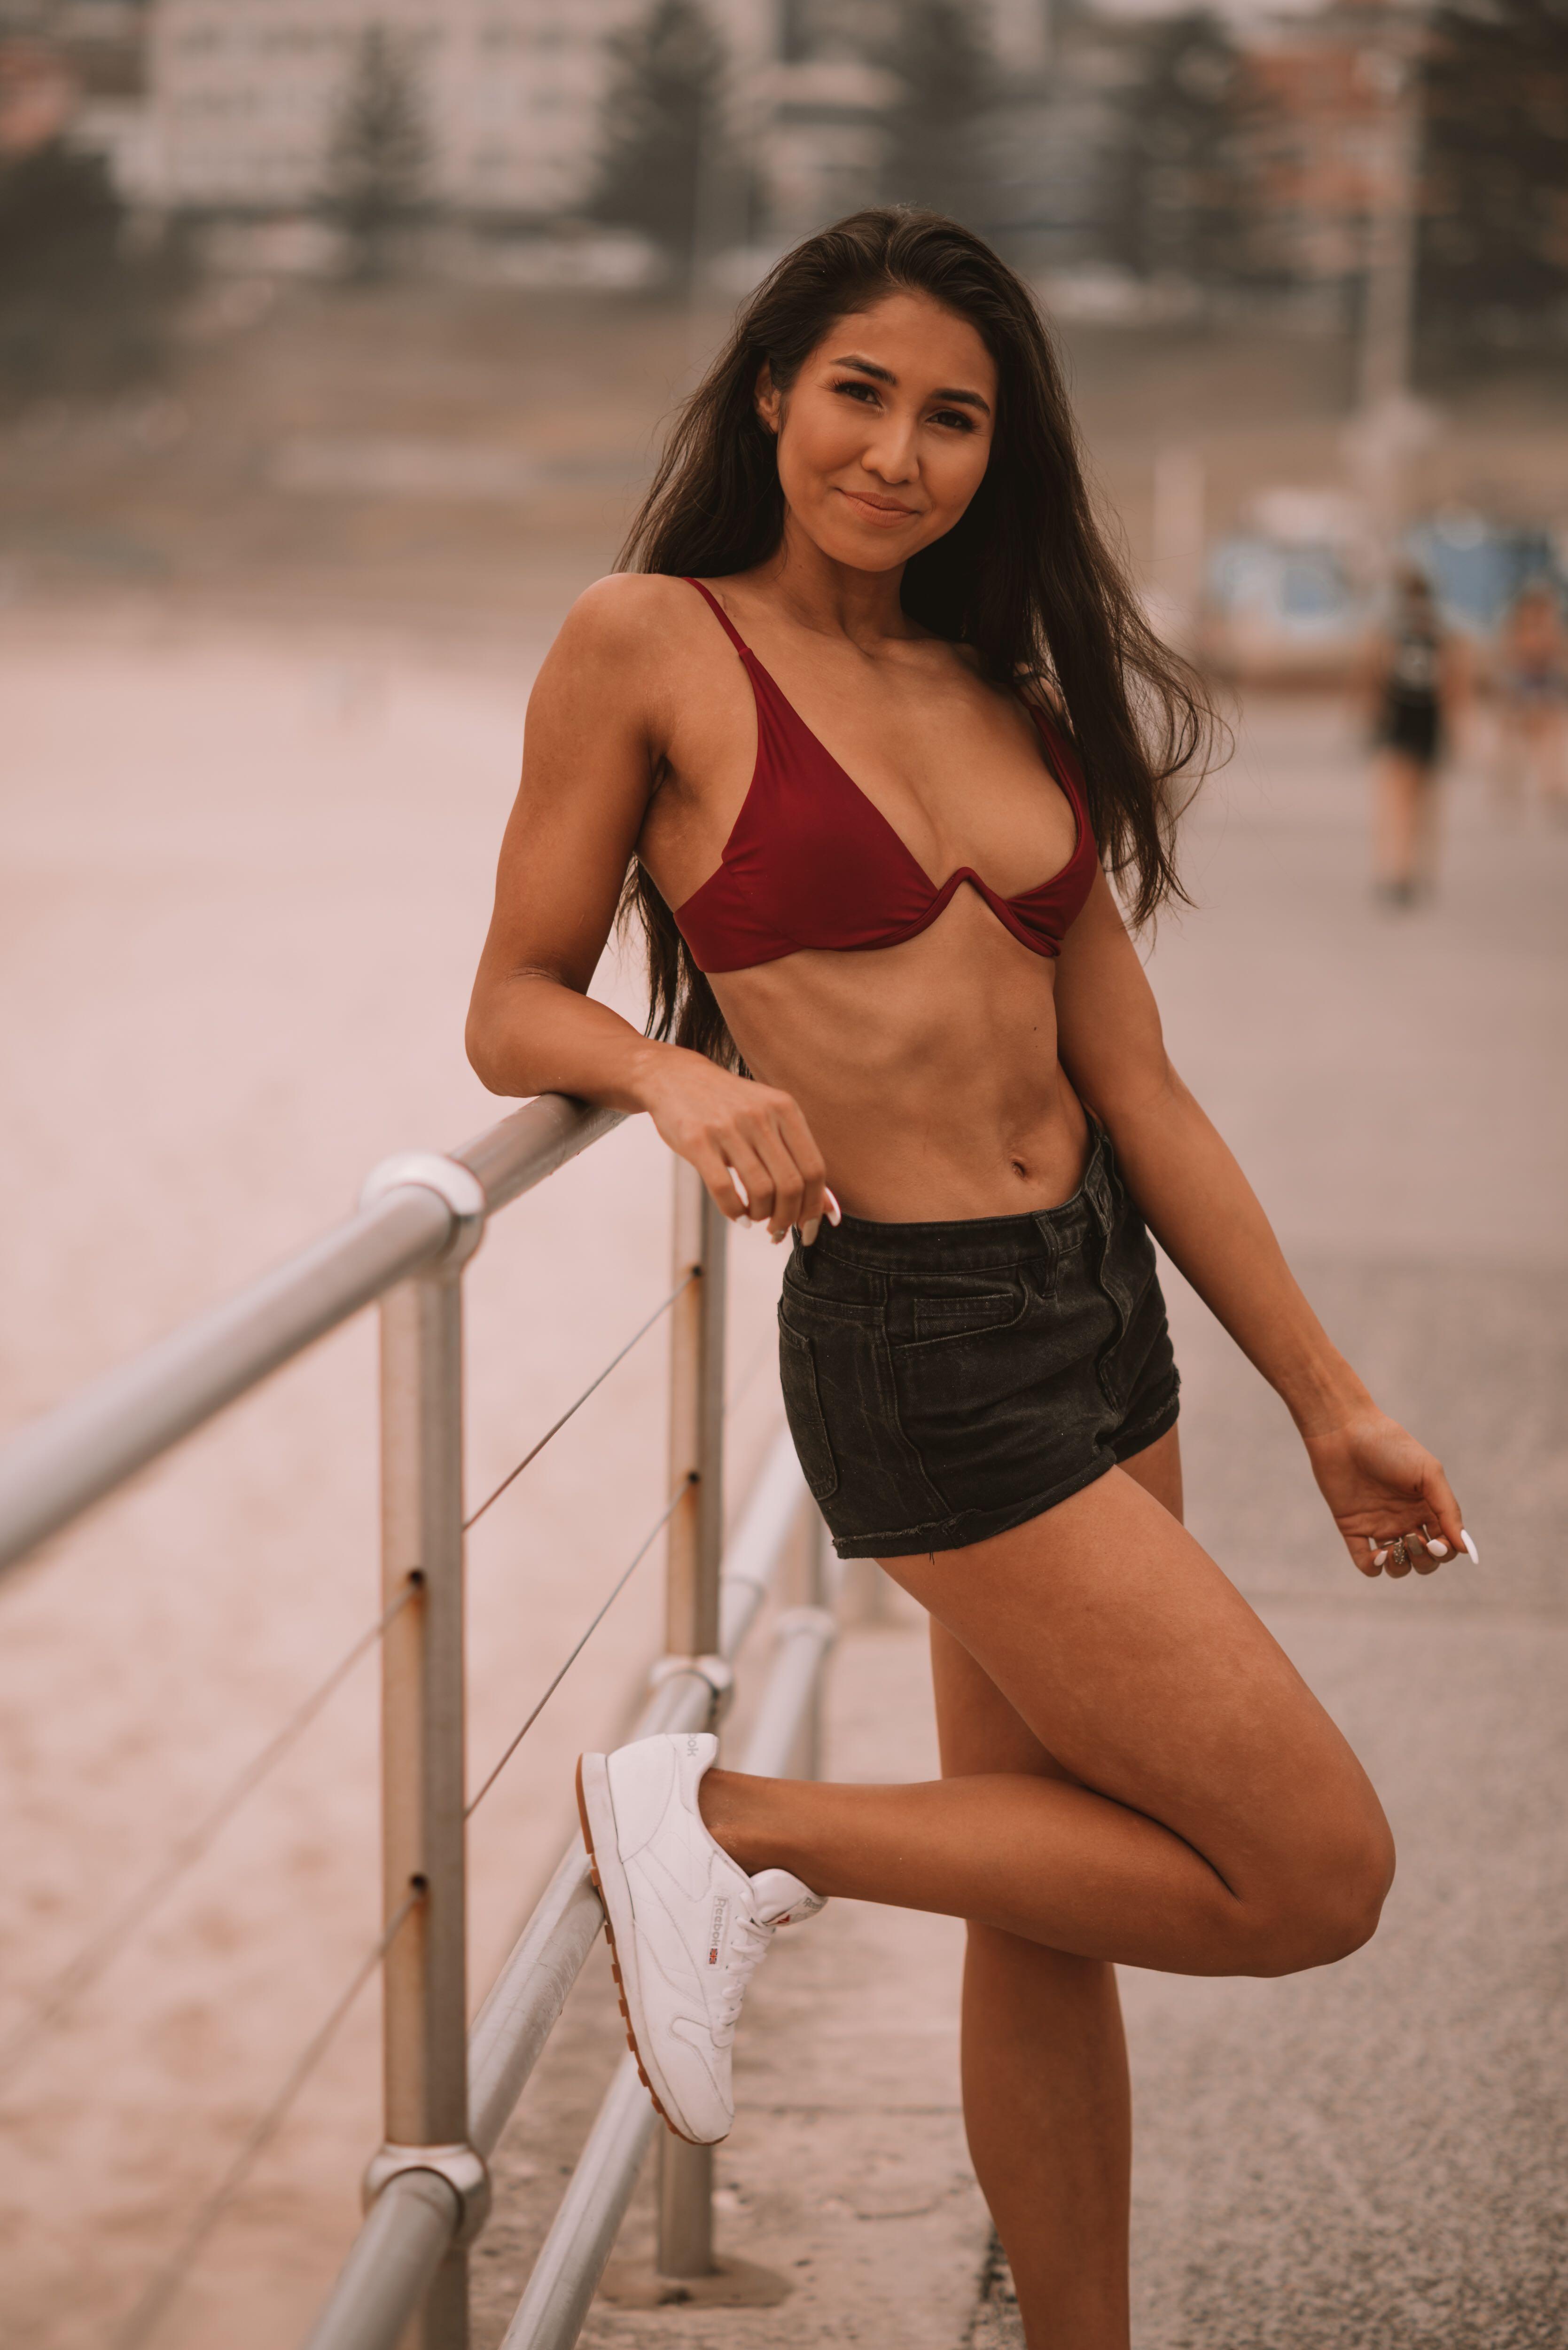 Bikini // Size 8